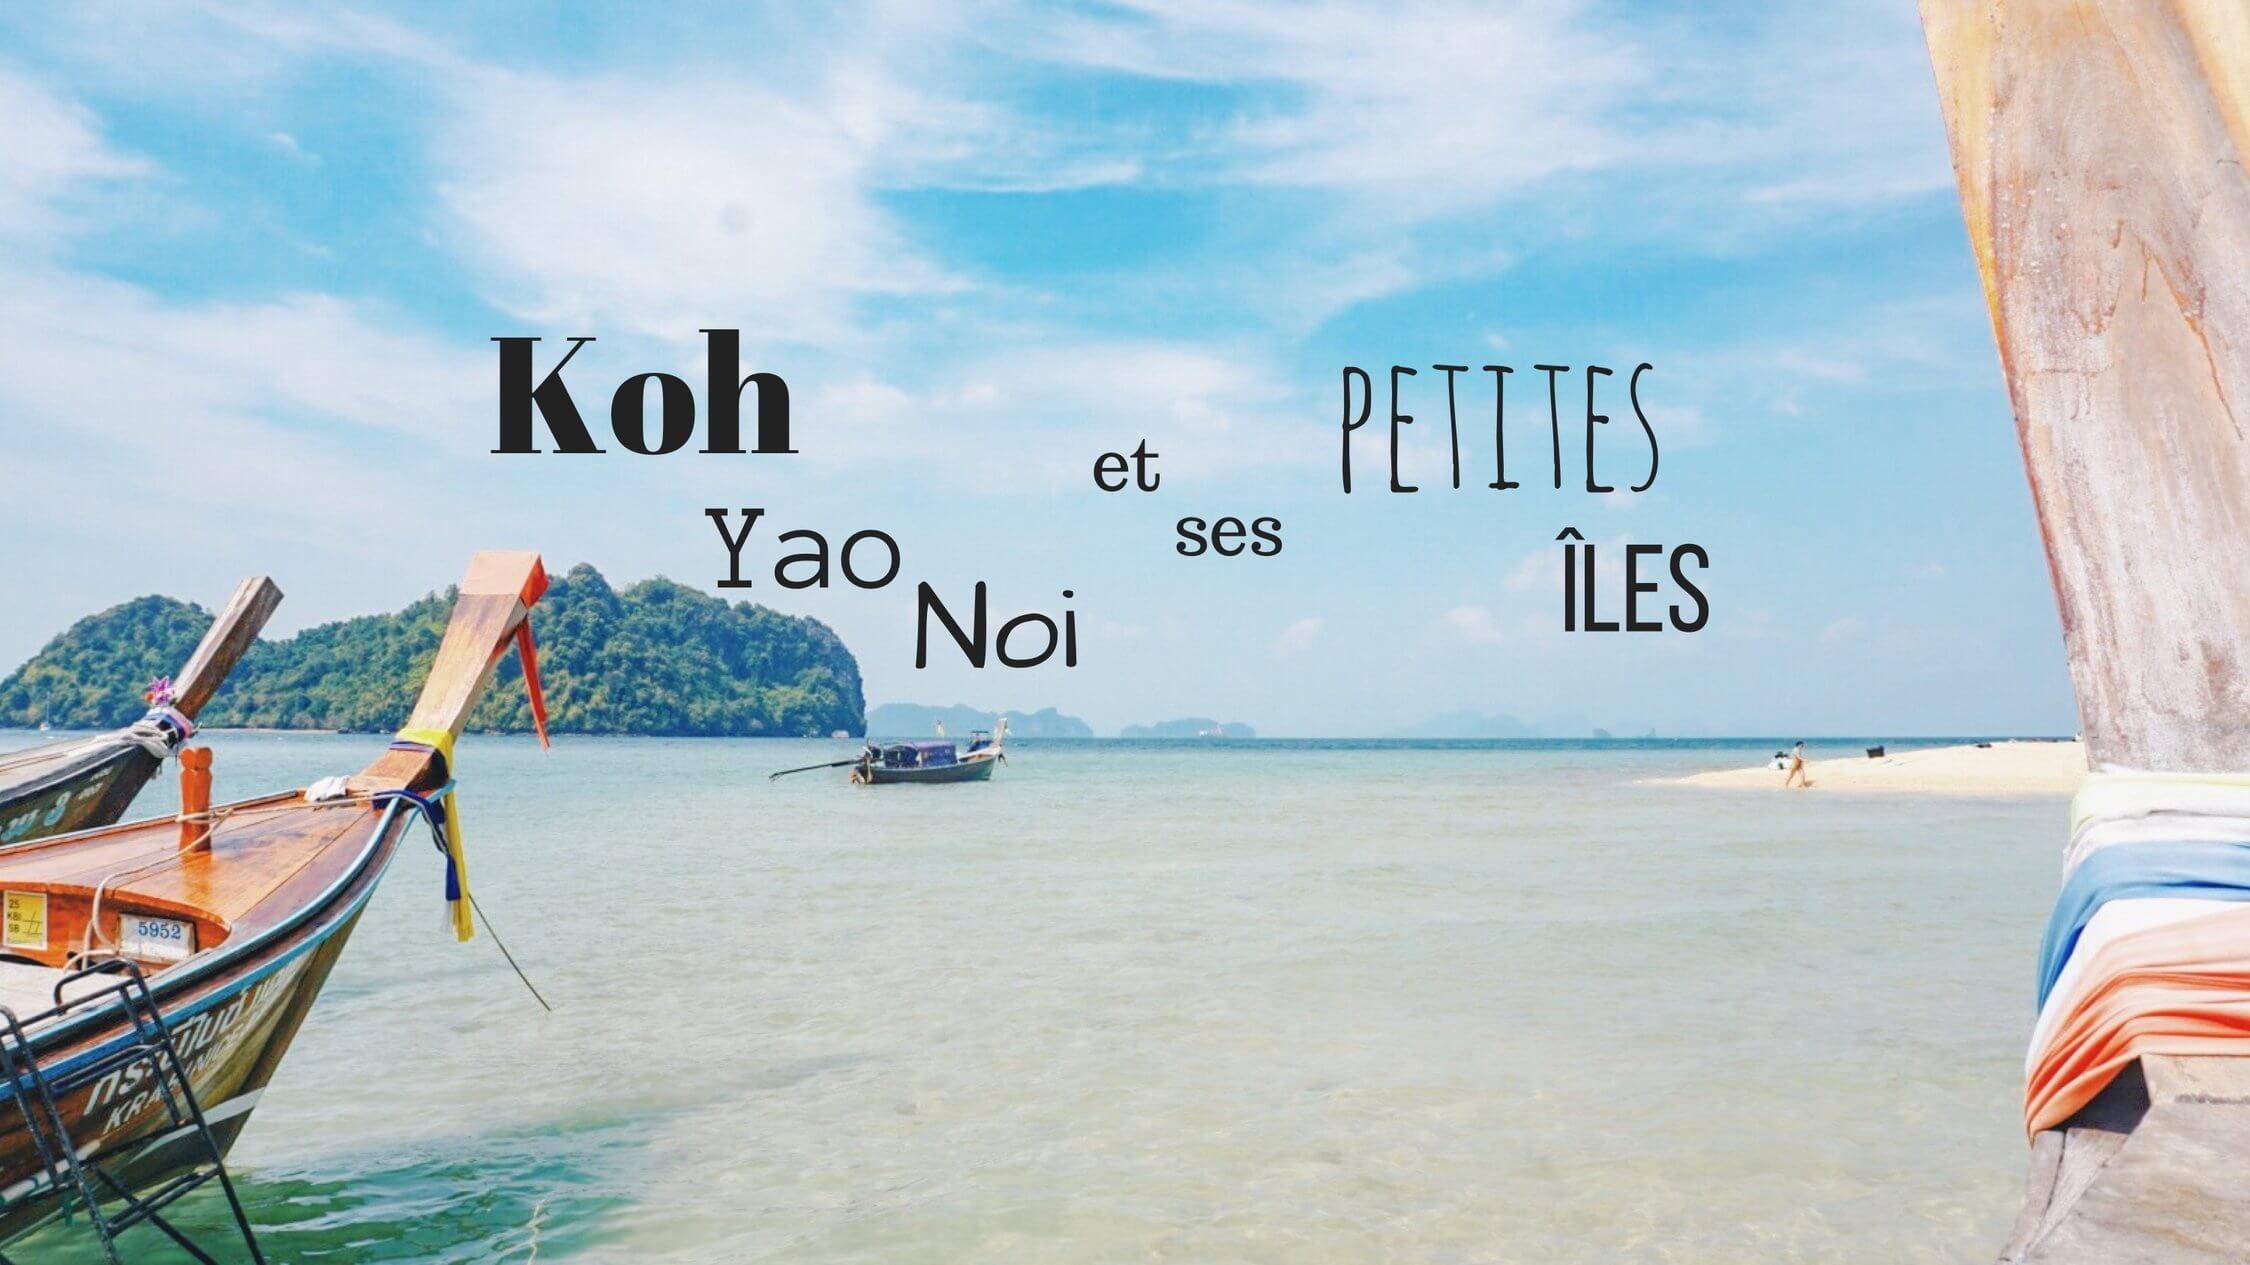 Visiter Koh Yao Noi Thailande